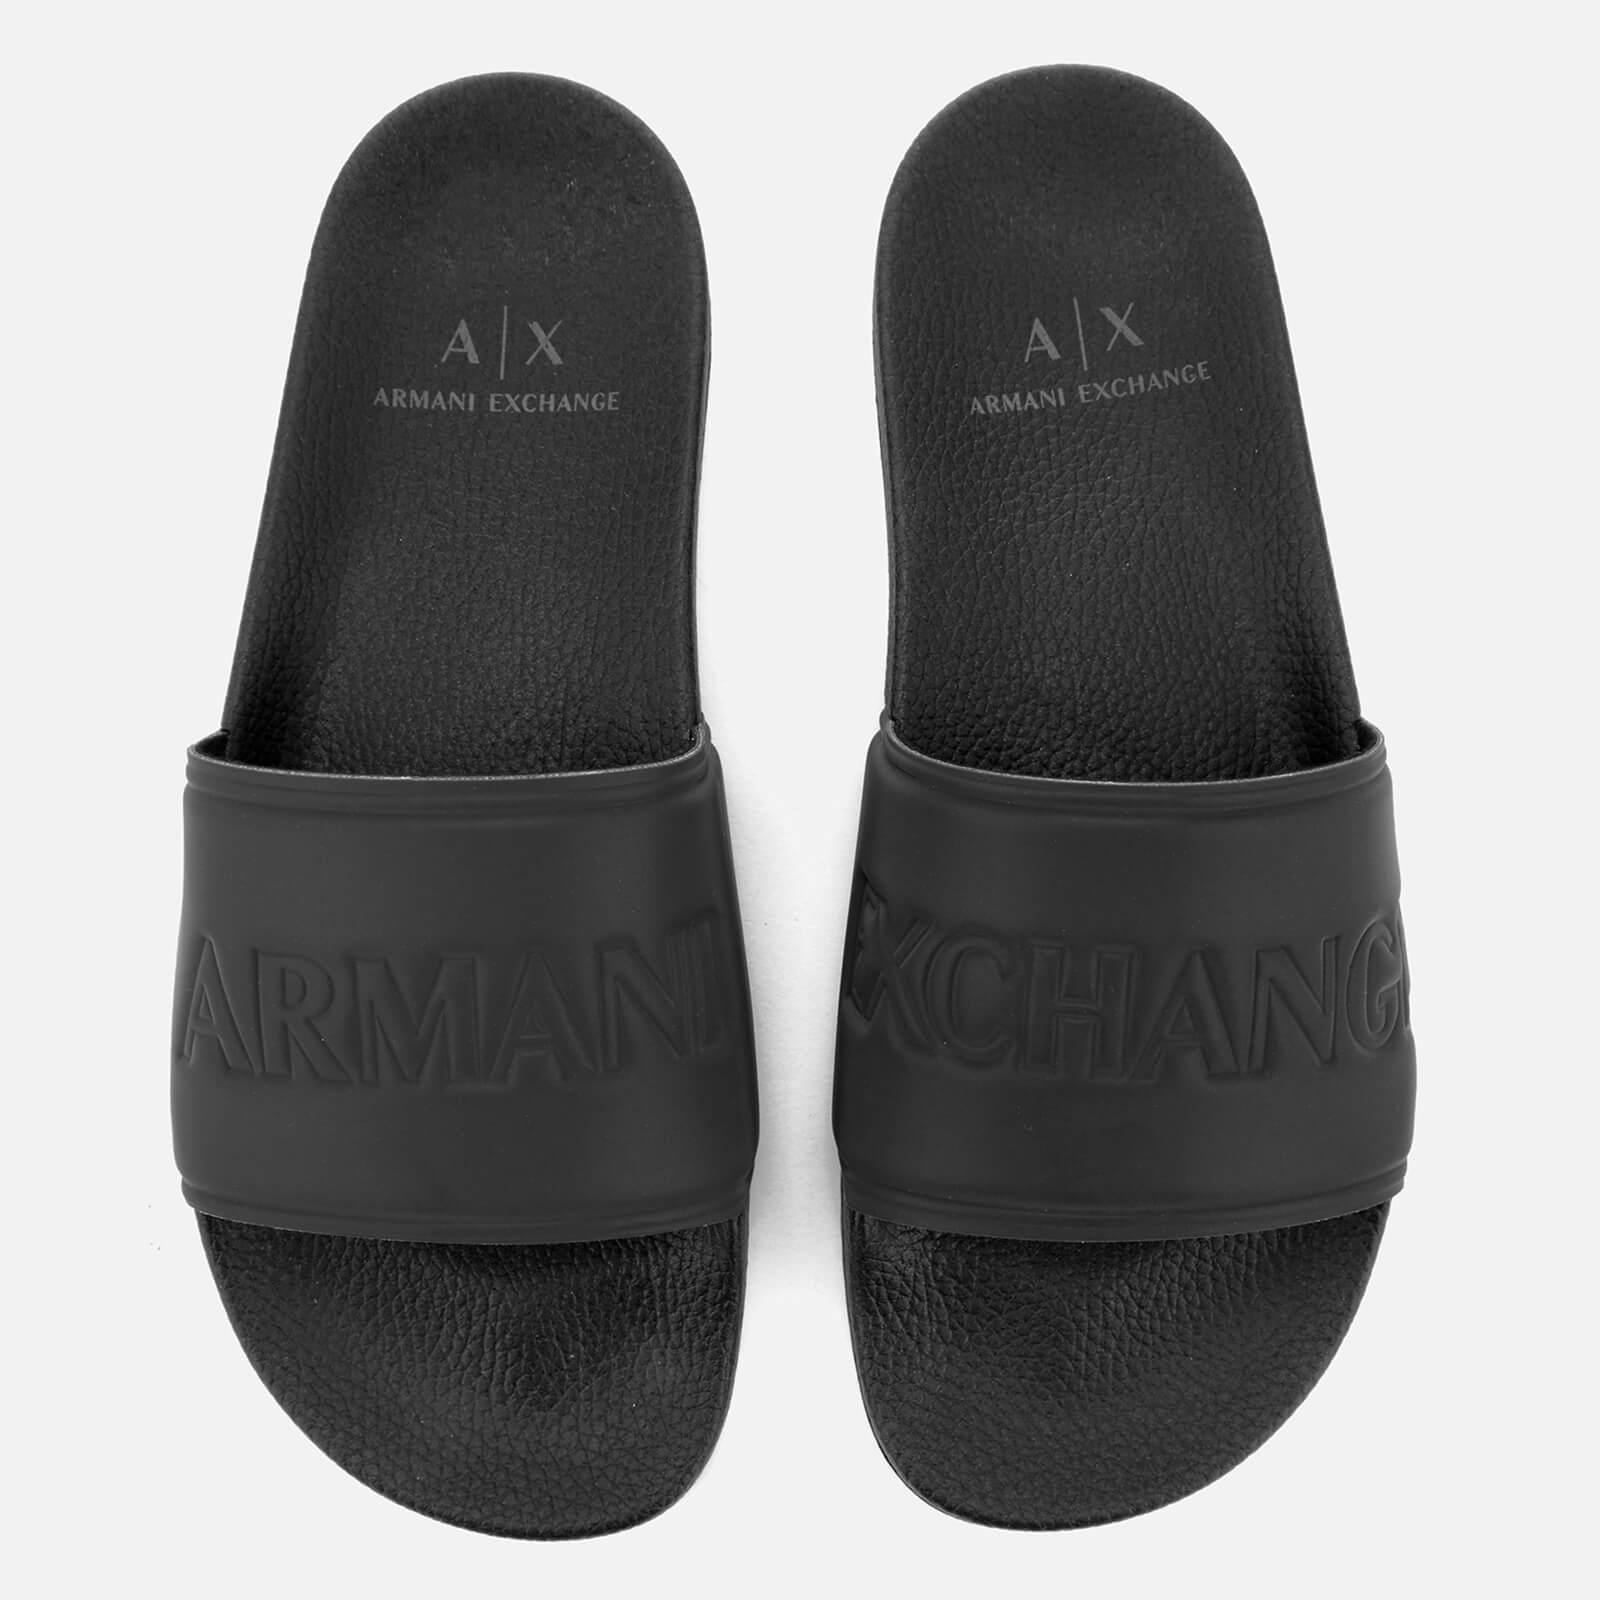 Armani Exchange Synthetic Mens Slides